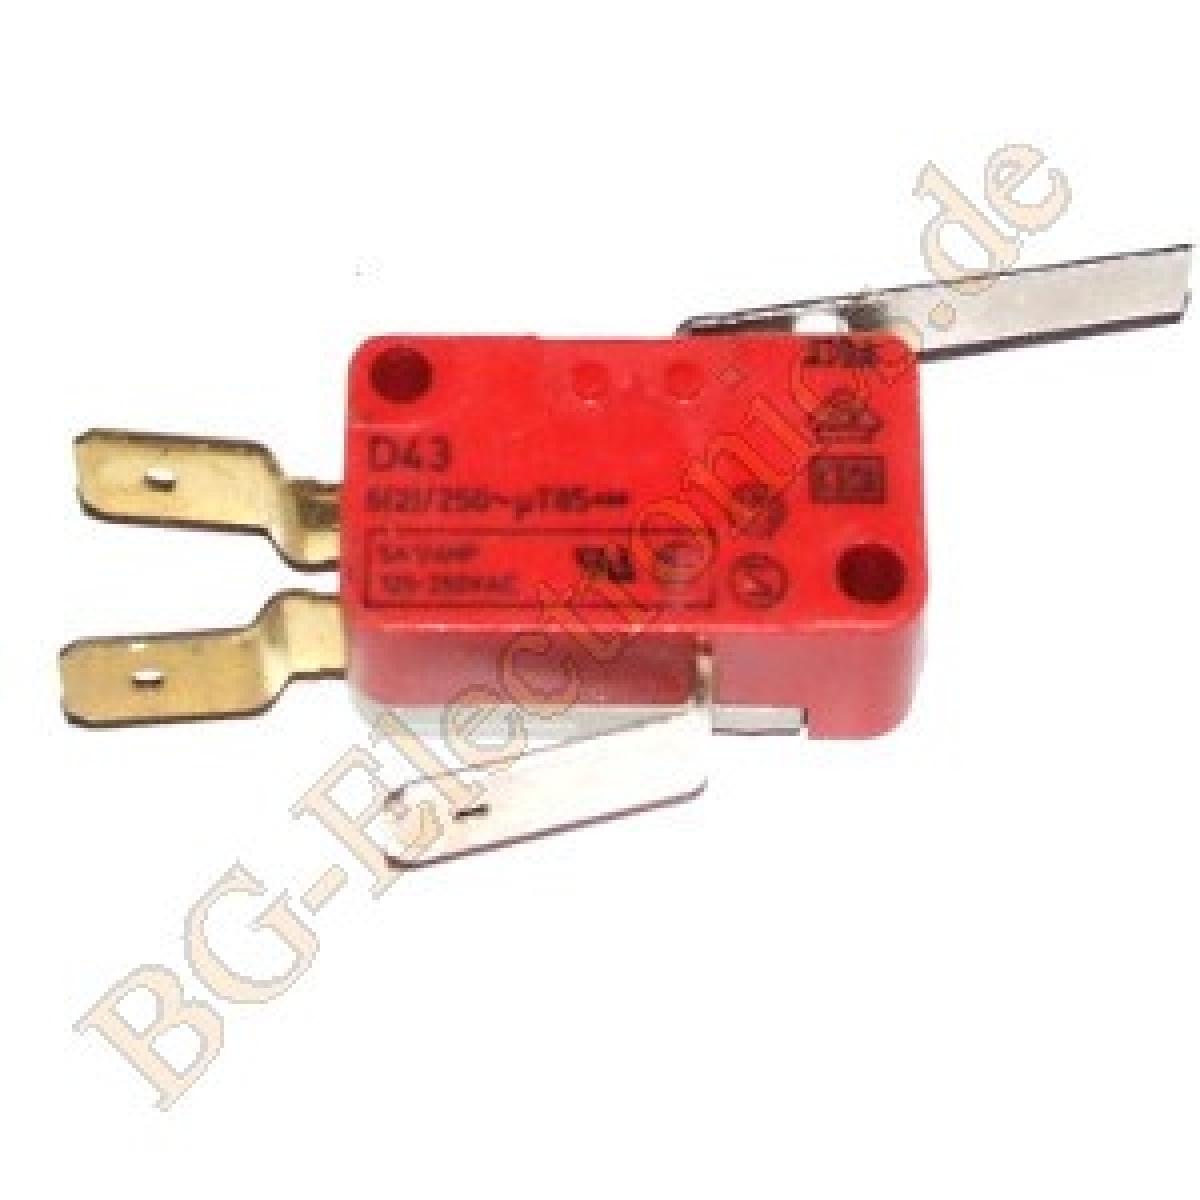 1-x-Schnappschalter-D43V3MA-KA-Schnappschalter-Mikroschalter-Cherry-1pcs